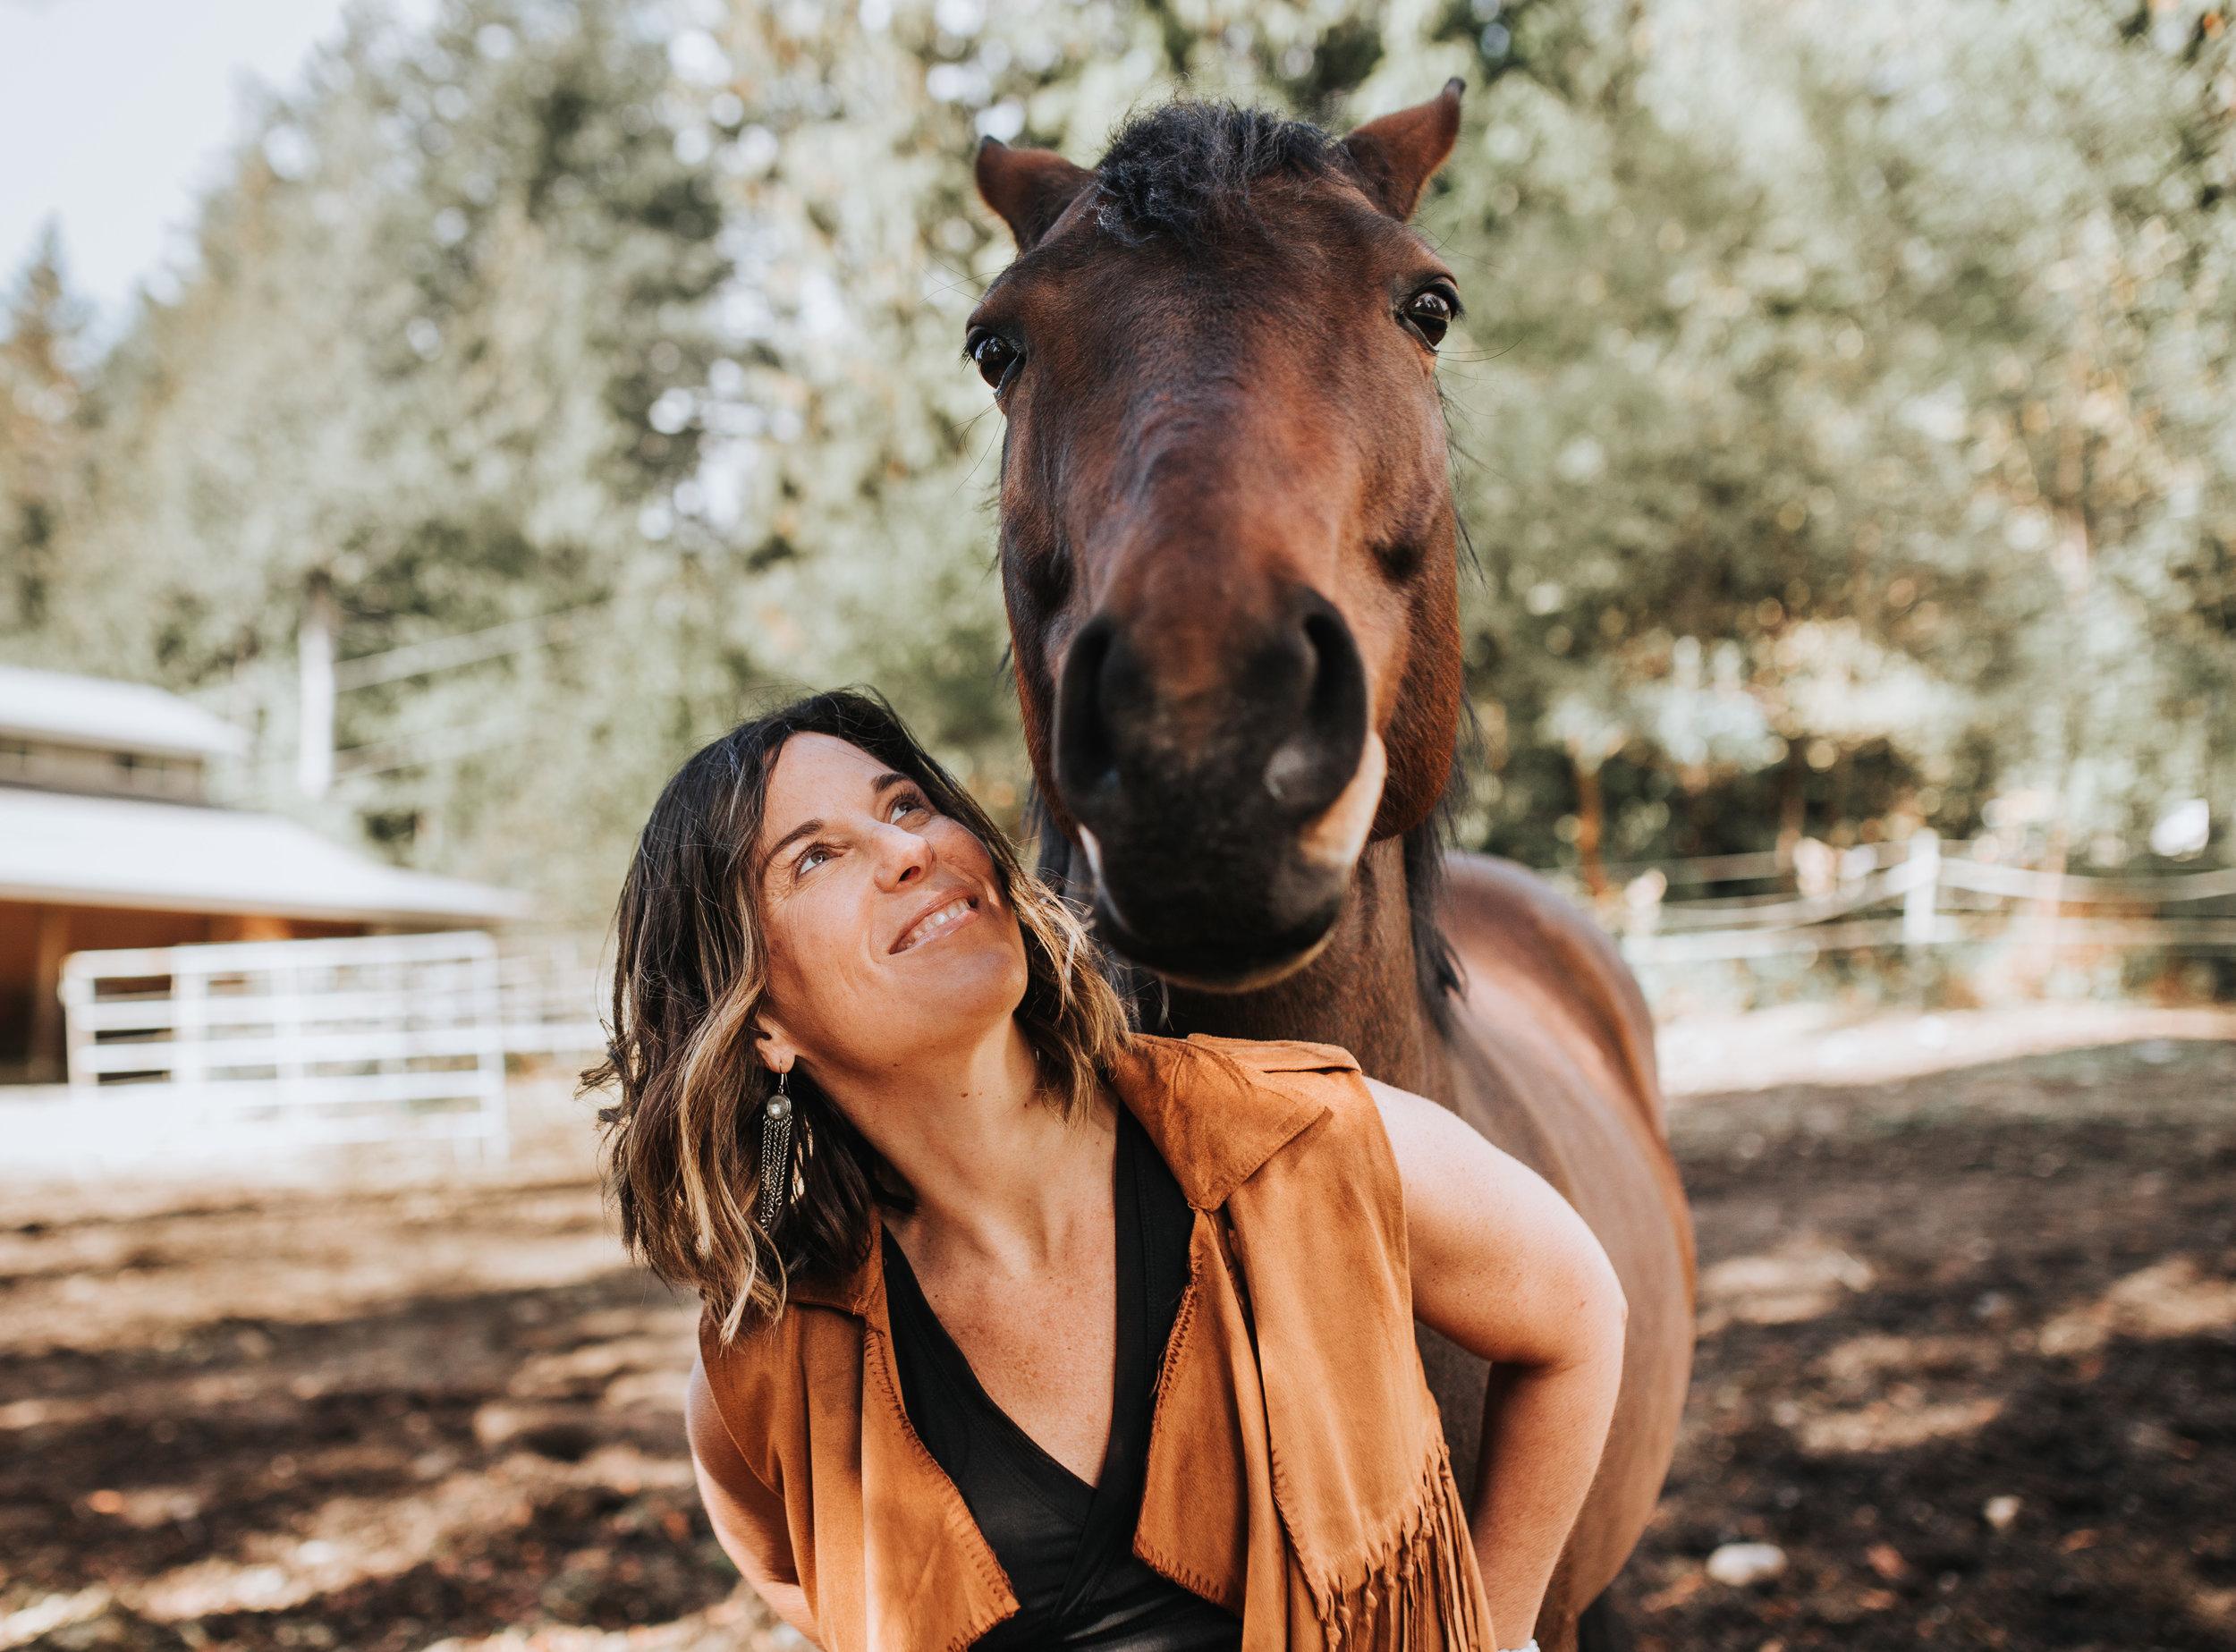 conscious-cowgirl-horse-sunshine-coast.jpg